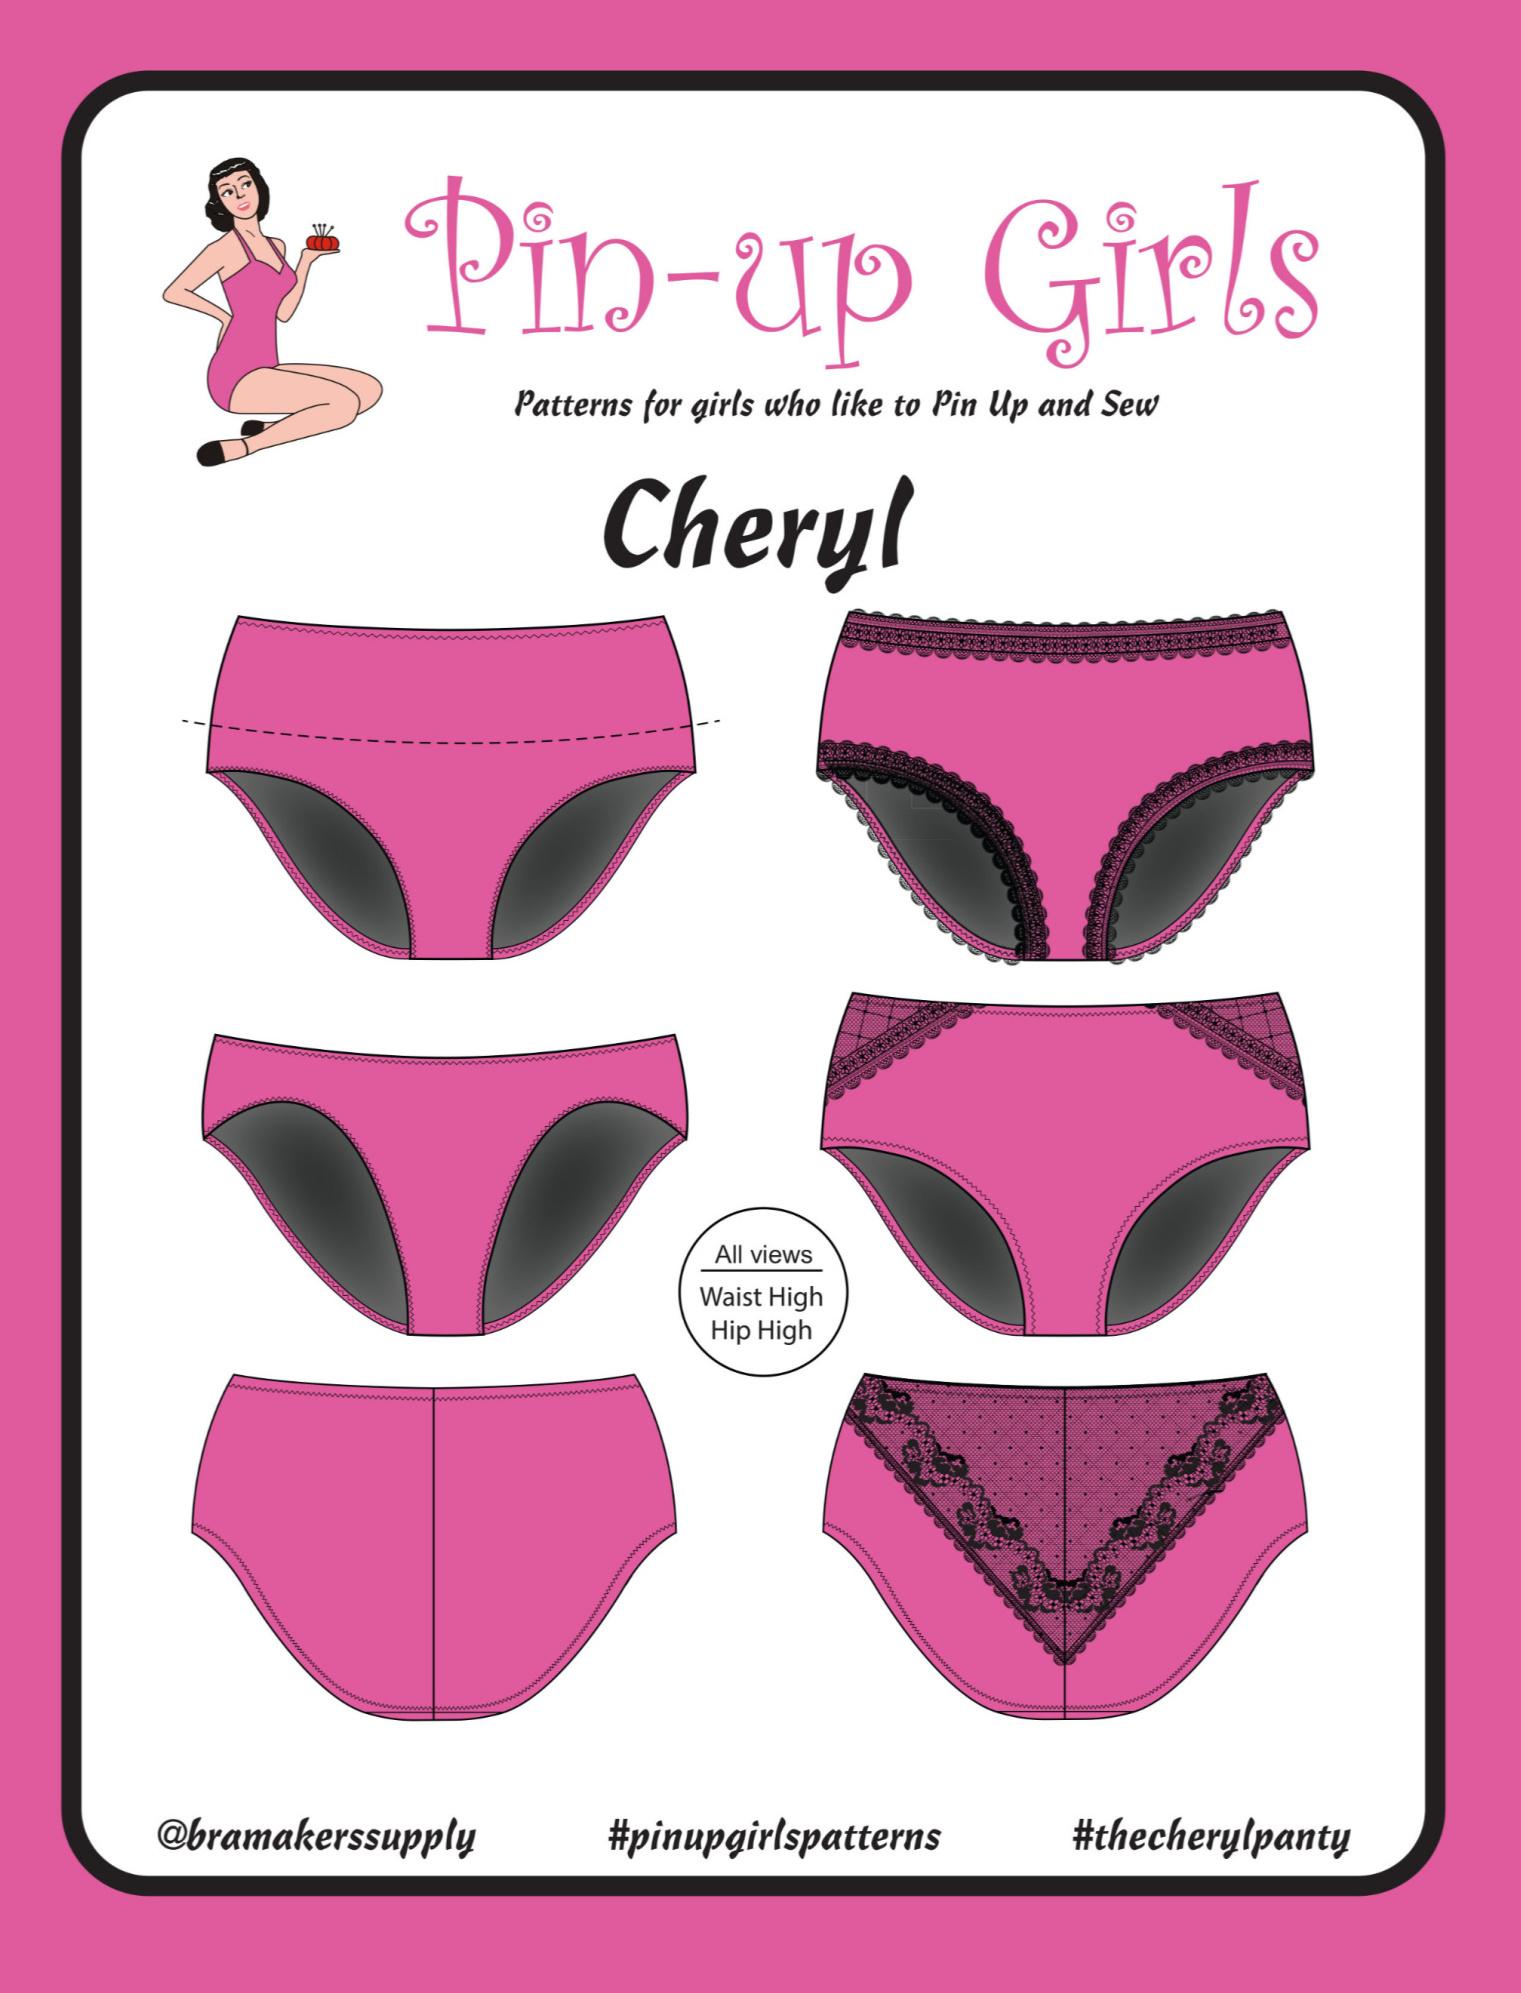 Bra Makers Supply Pin Up Girls Cheryl Back Seam Panty Pattern